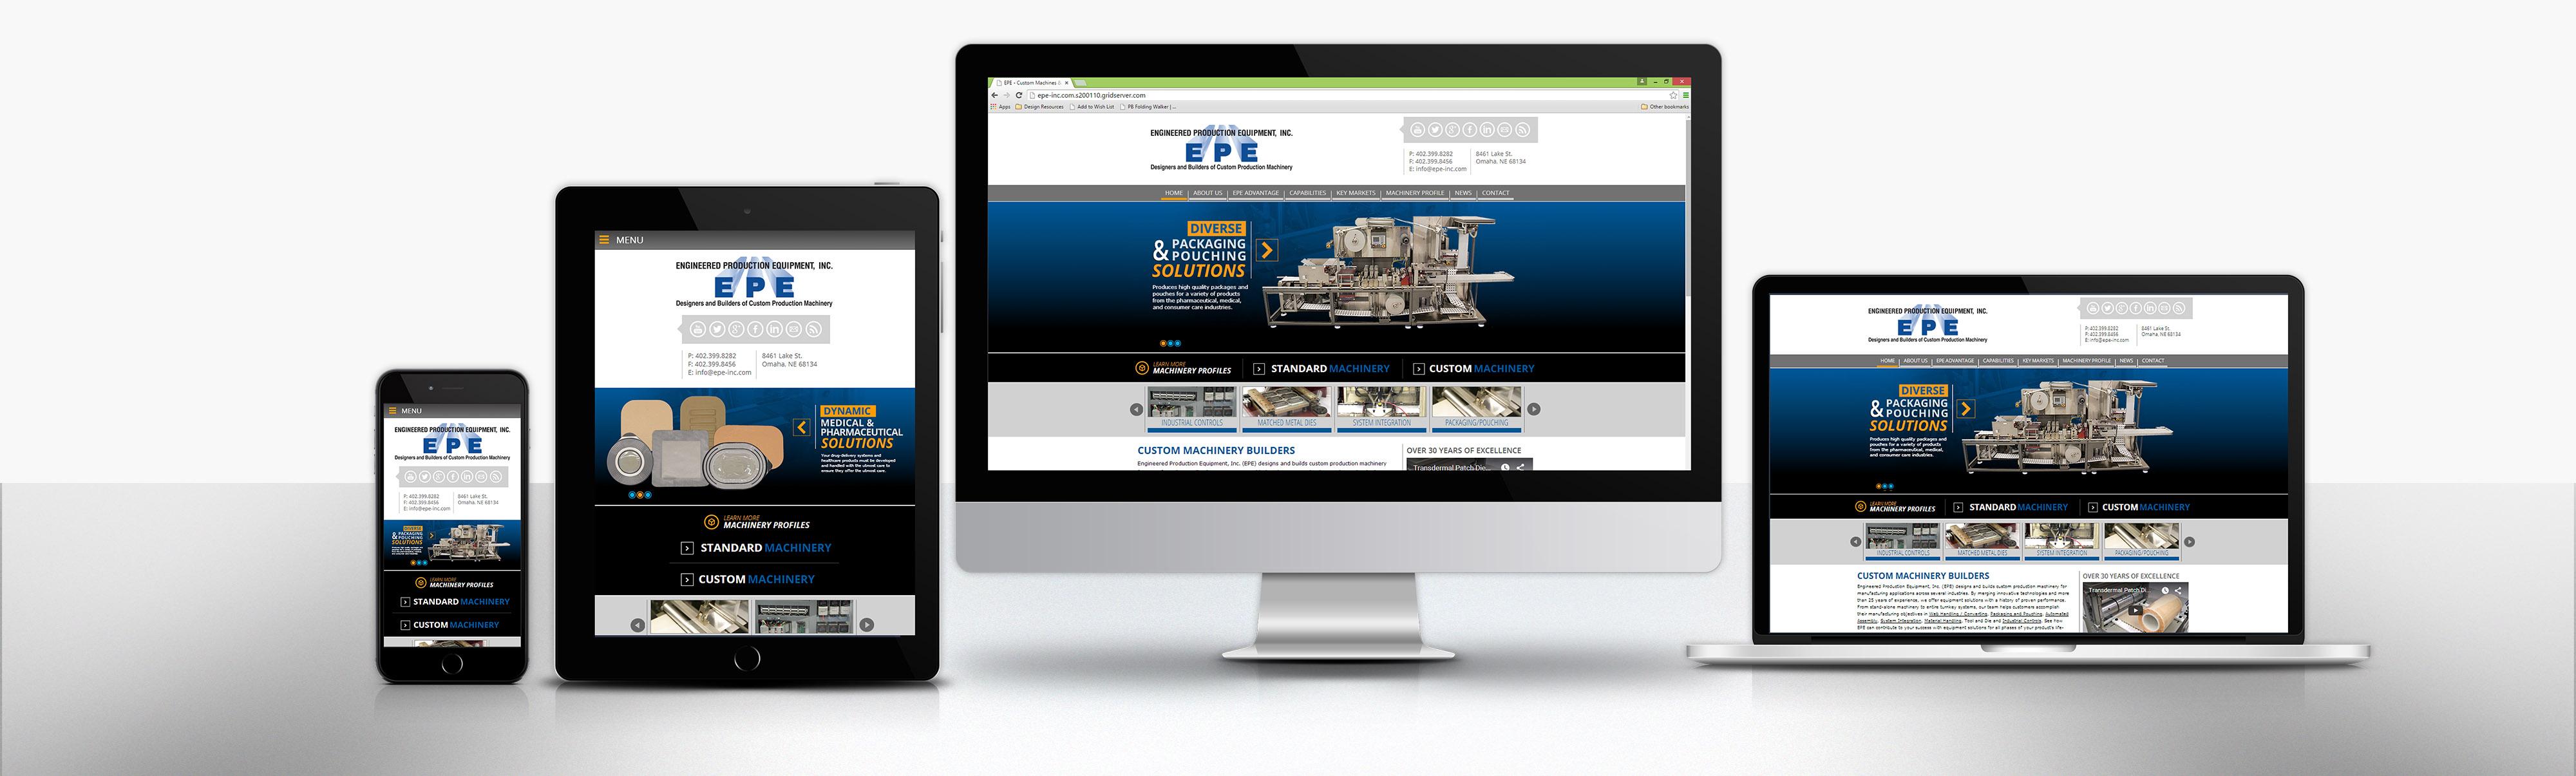 Responsive website design slider